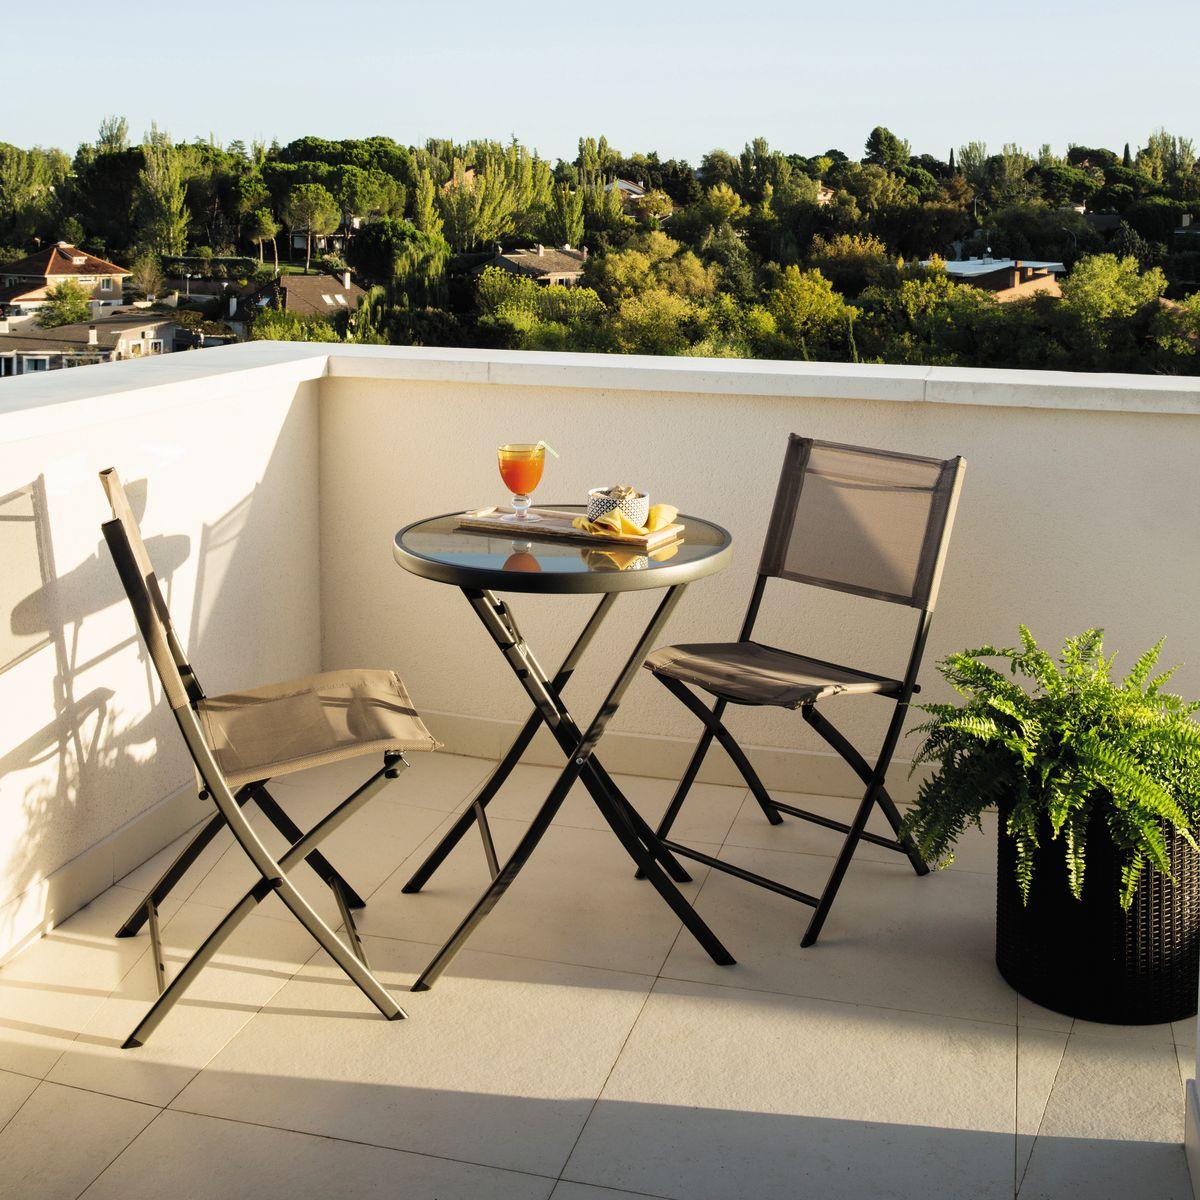 Tavoli e sedie in rattan amazing mobili da giardino - Tavolo da giardino leroy merlin ...